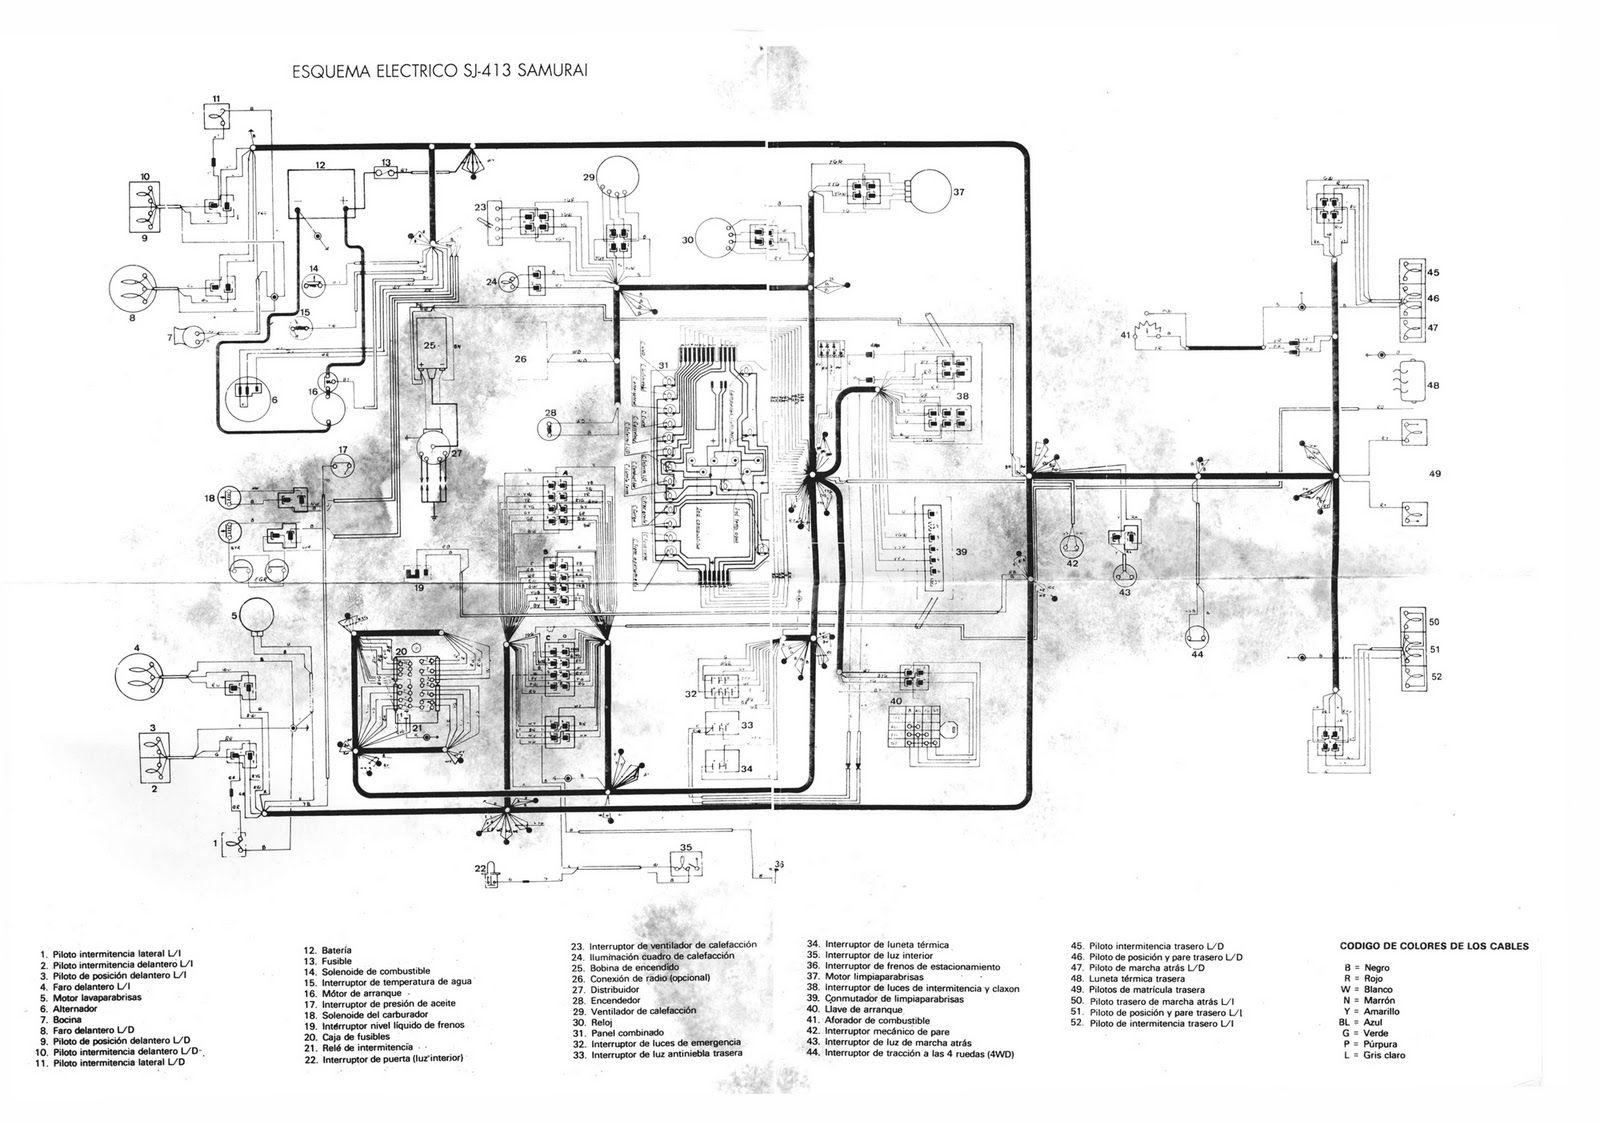 96 Suzuki Samurai Engine Diagram - Wiring Diagram Networks